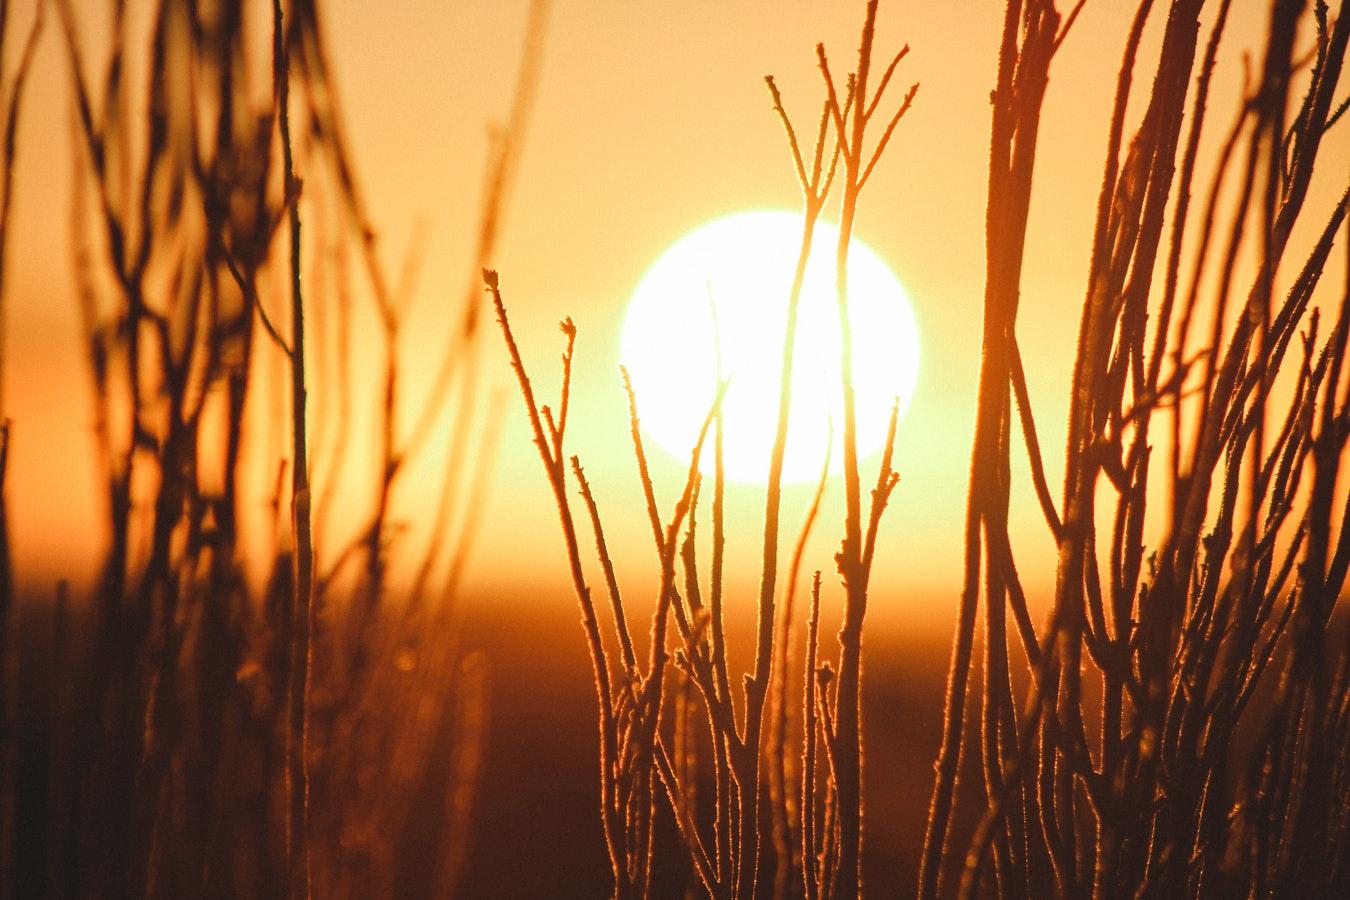 The sun peeking through plants.